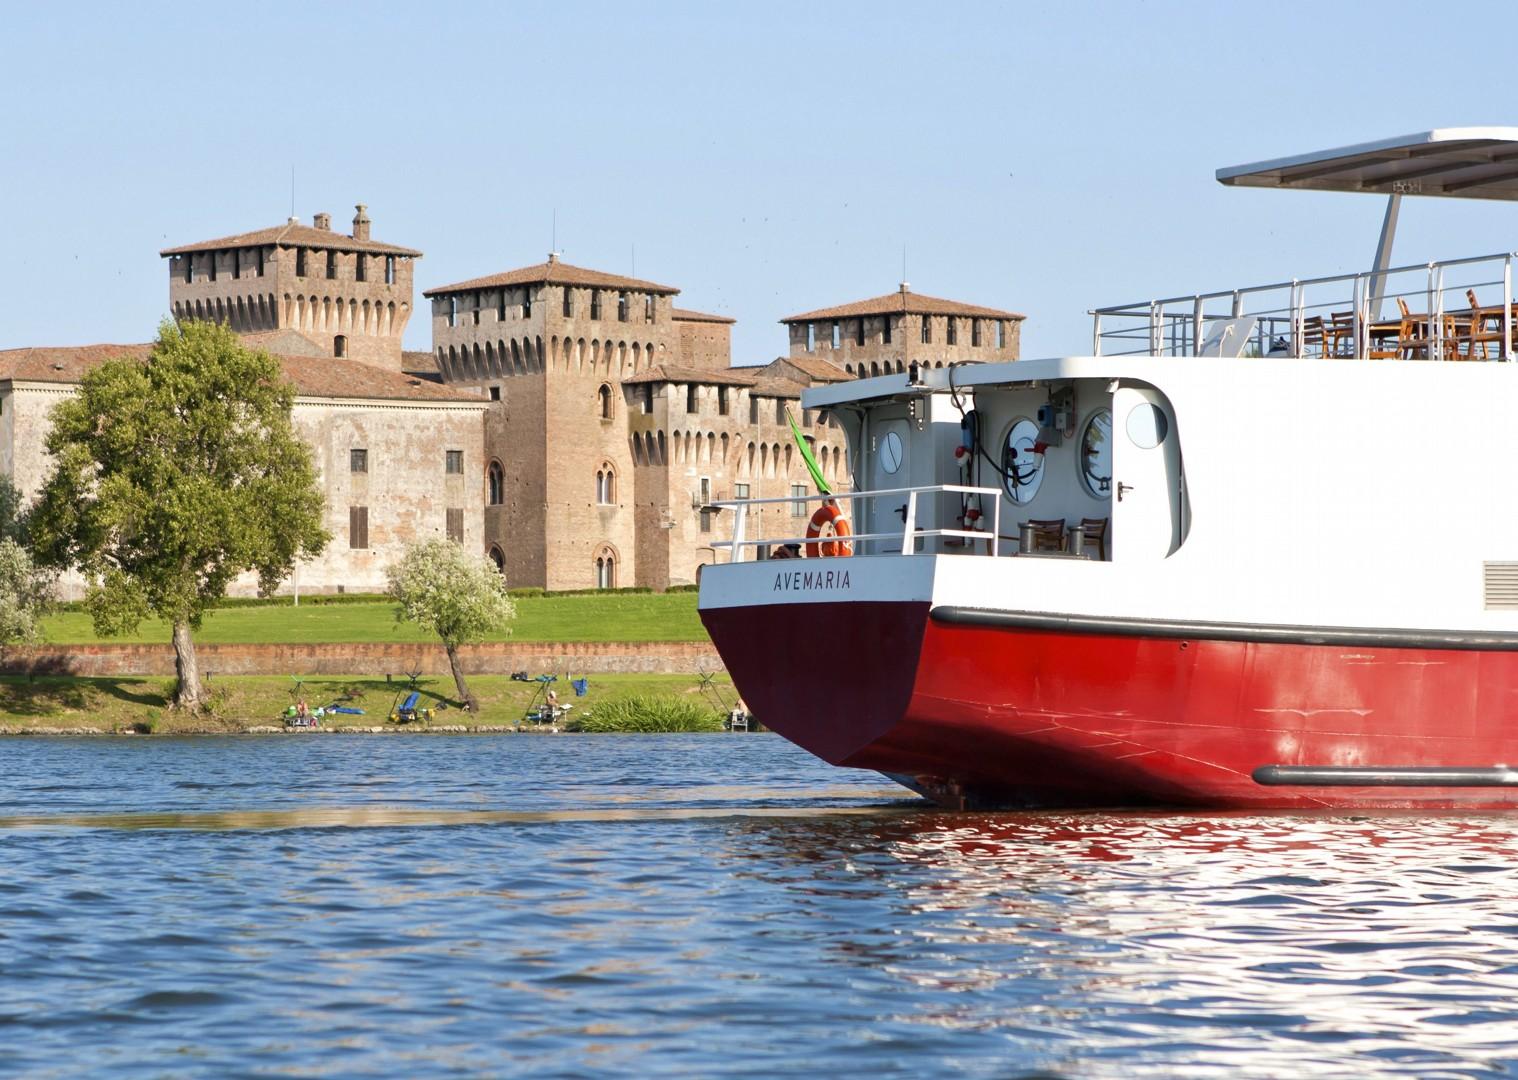 waterwaysofvenice5.jpg - Italy - Venetian Waterways (Mantova to Venice) - Bike and Barge Holiday - Leisure Cycling